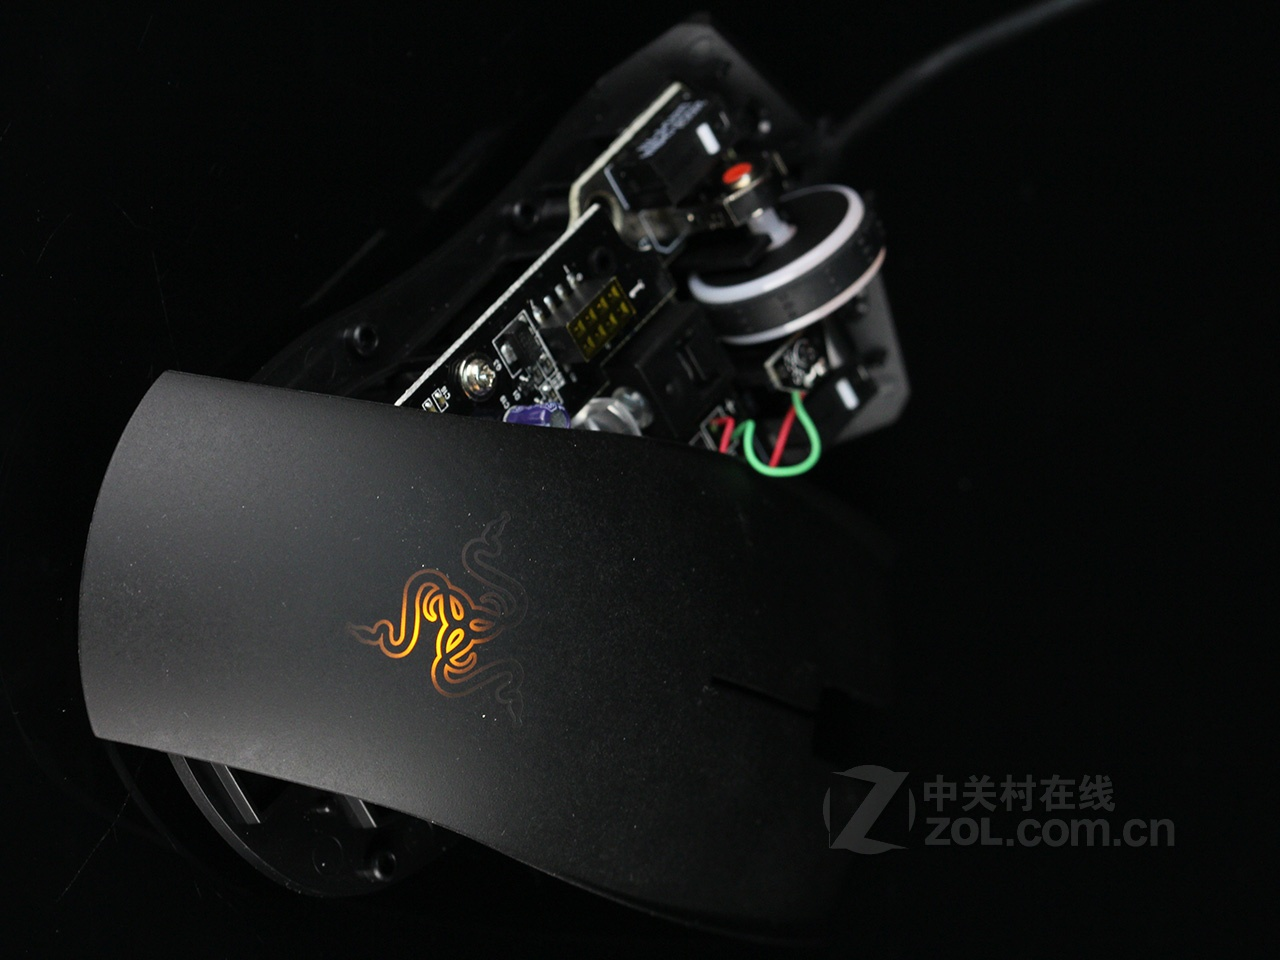 razer 金环蛇2013游戏鼠标